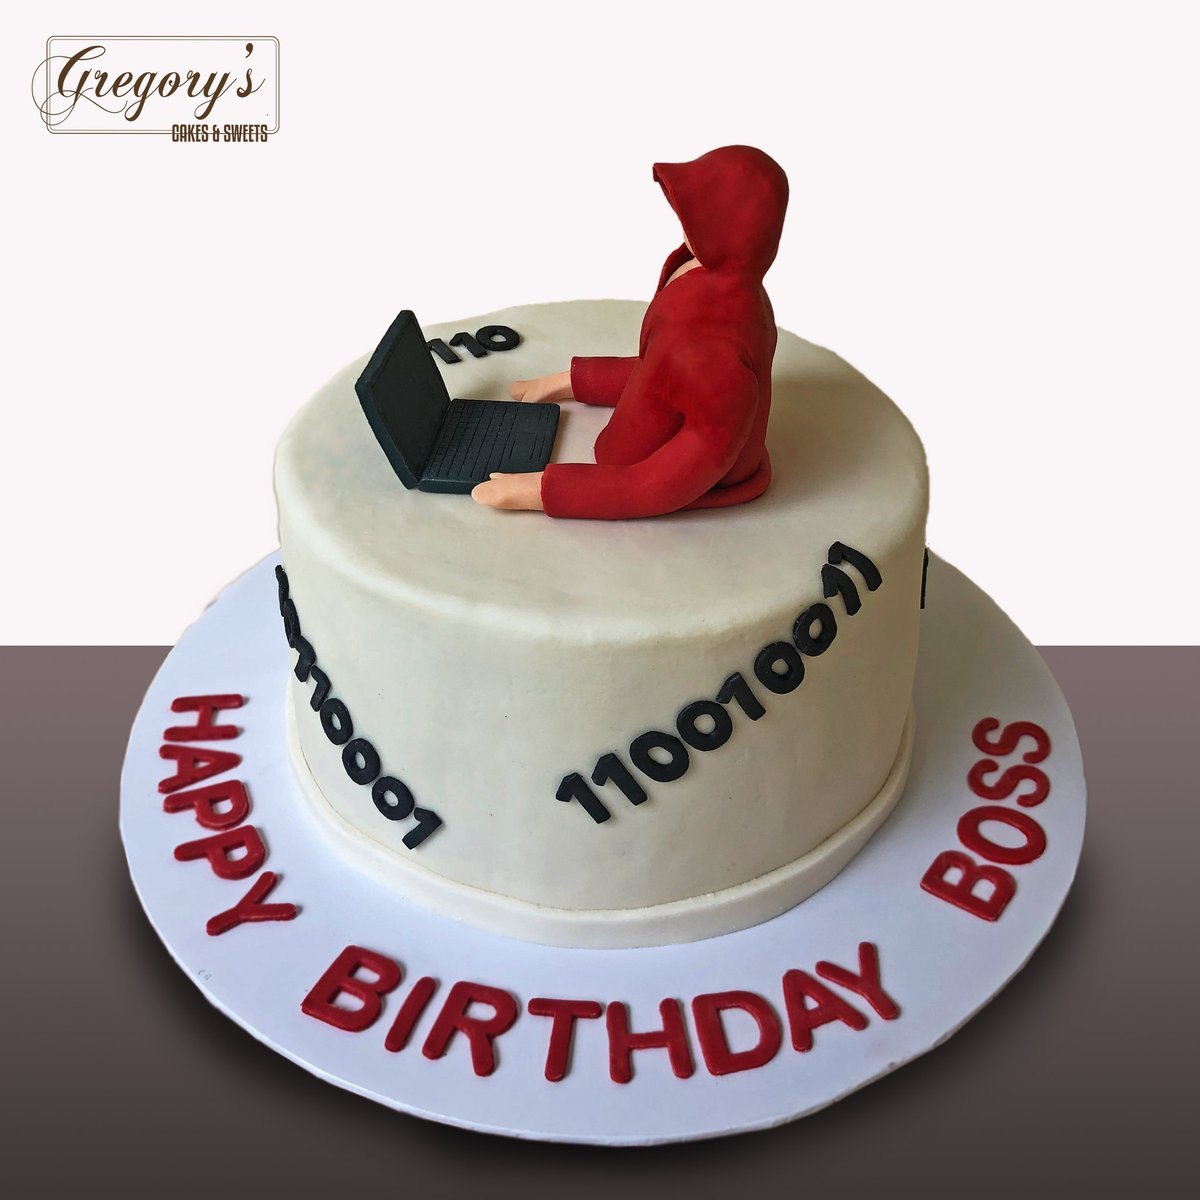 #Cake 🍰 Awesome of the Day ⭐ ➡️ #Geek 🤓 #Birthdaycake 🎂 #Binary Code 💻 via @Gregoryscakes #SamaCake 🎂 #SamaGeek 🧐  ➡️ View More #SamaCollection 👉 https://t.co/Kugls40kPu